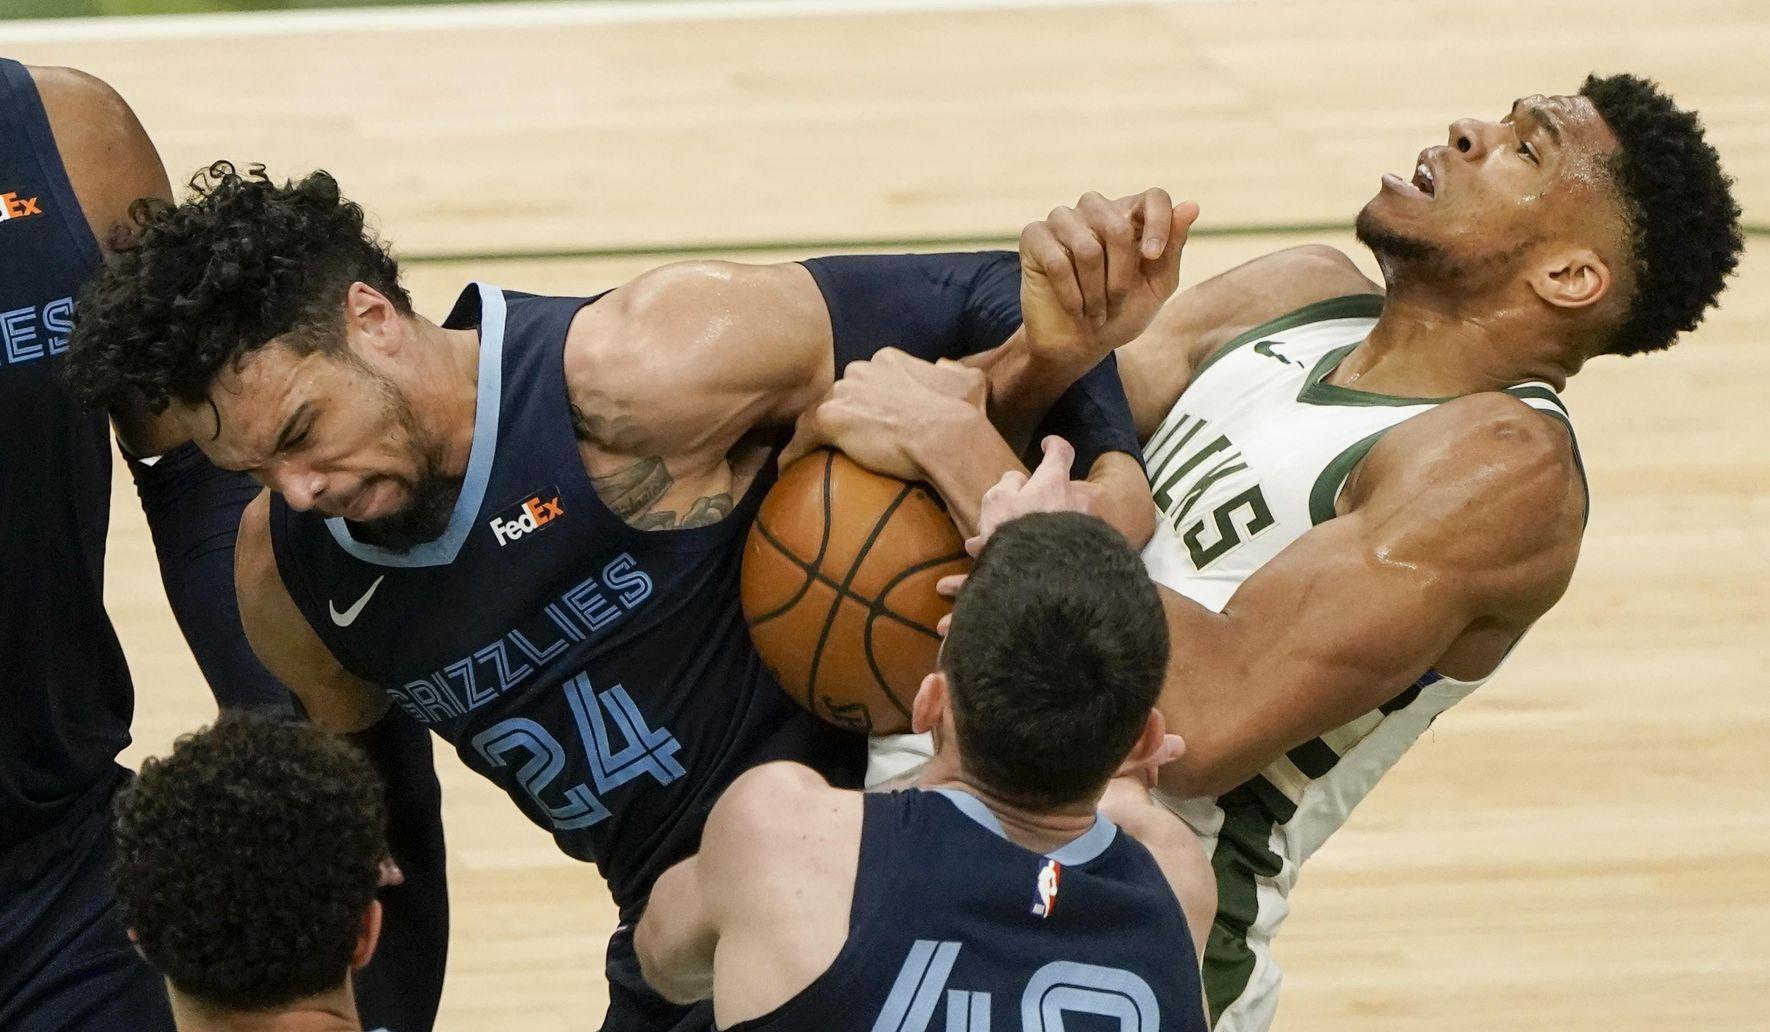 Grizzlies_bucks_basketball_25012_c0-147-3476-2173_s1770x1032